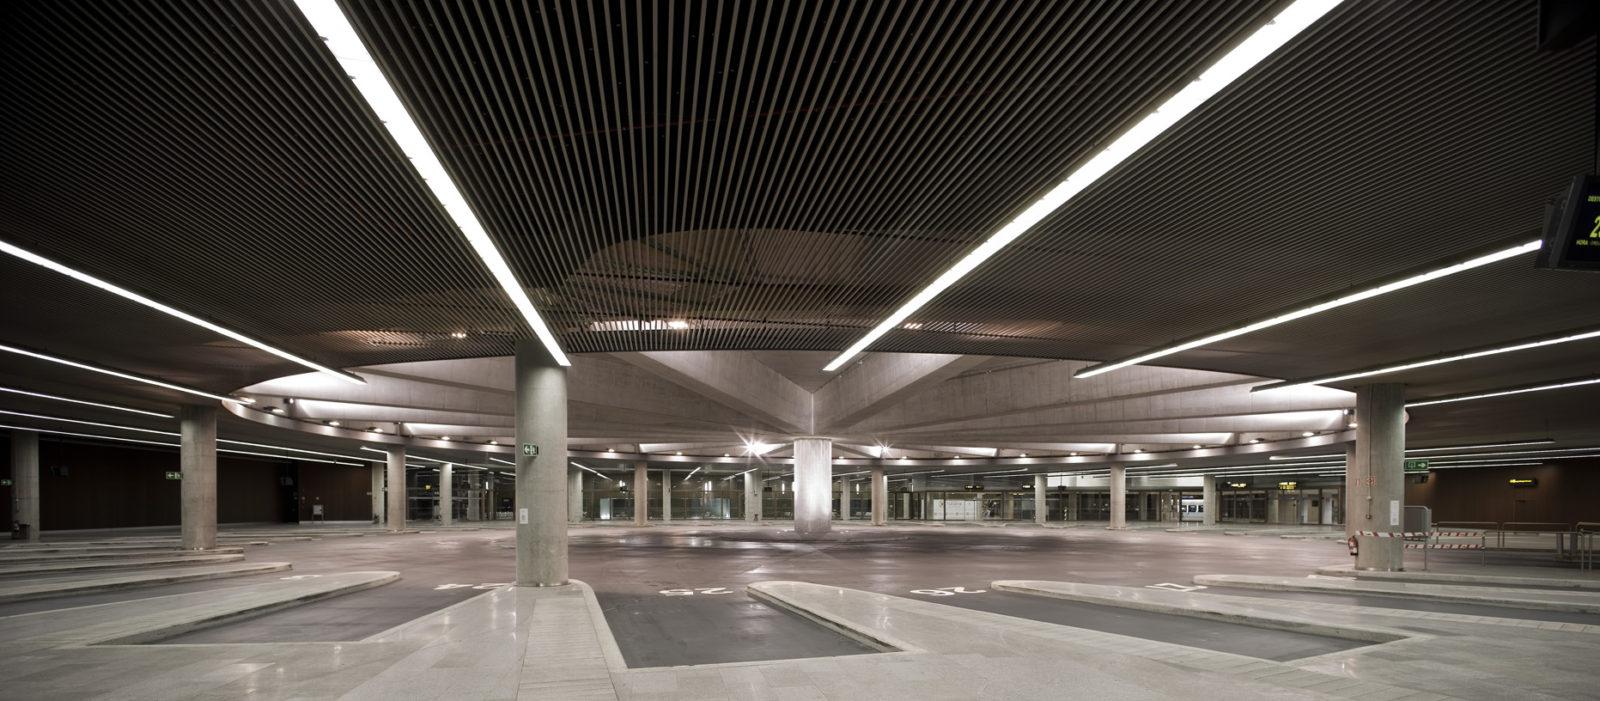 Pamplona_Coach_Station_02_Architecture_IDOM_photos_Pedro_Pegenaute